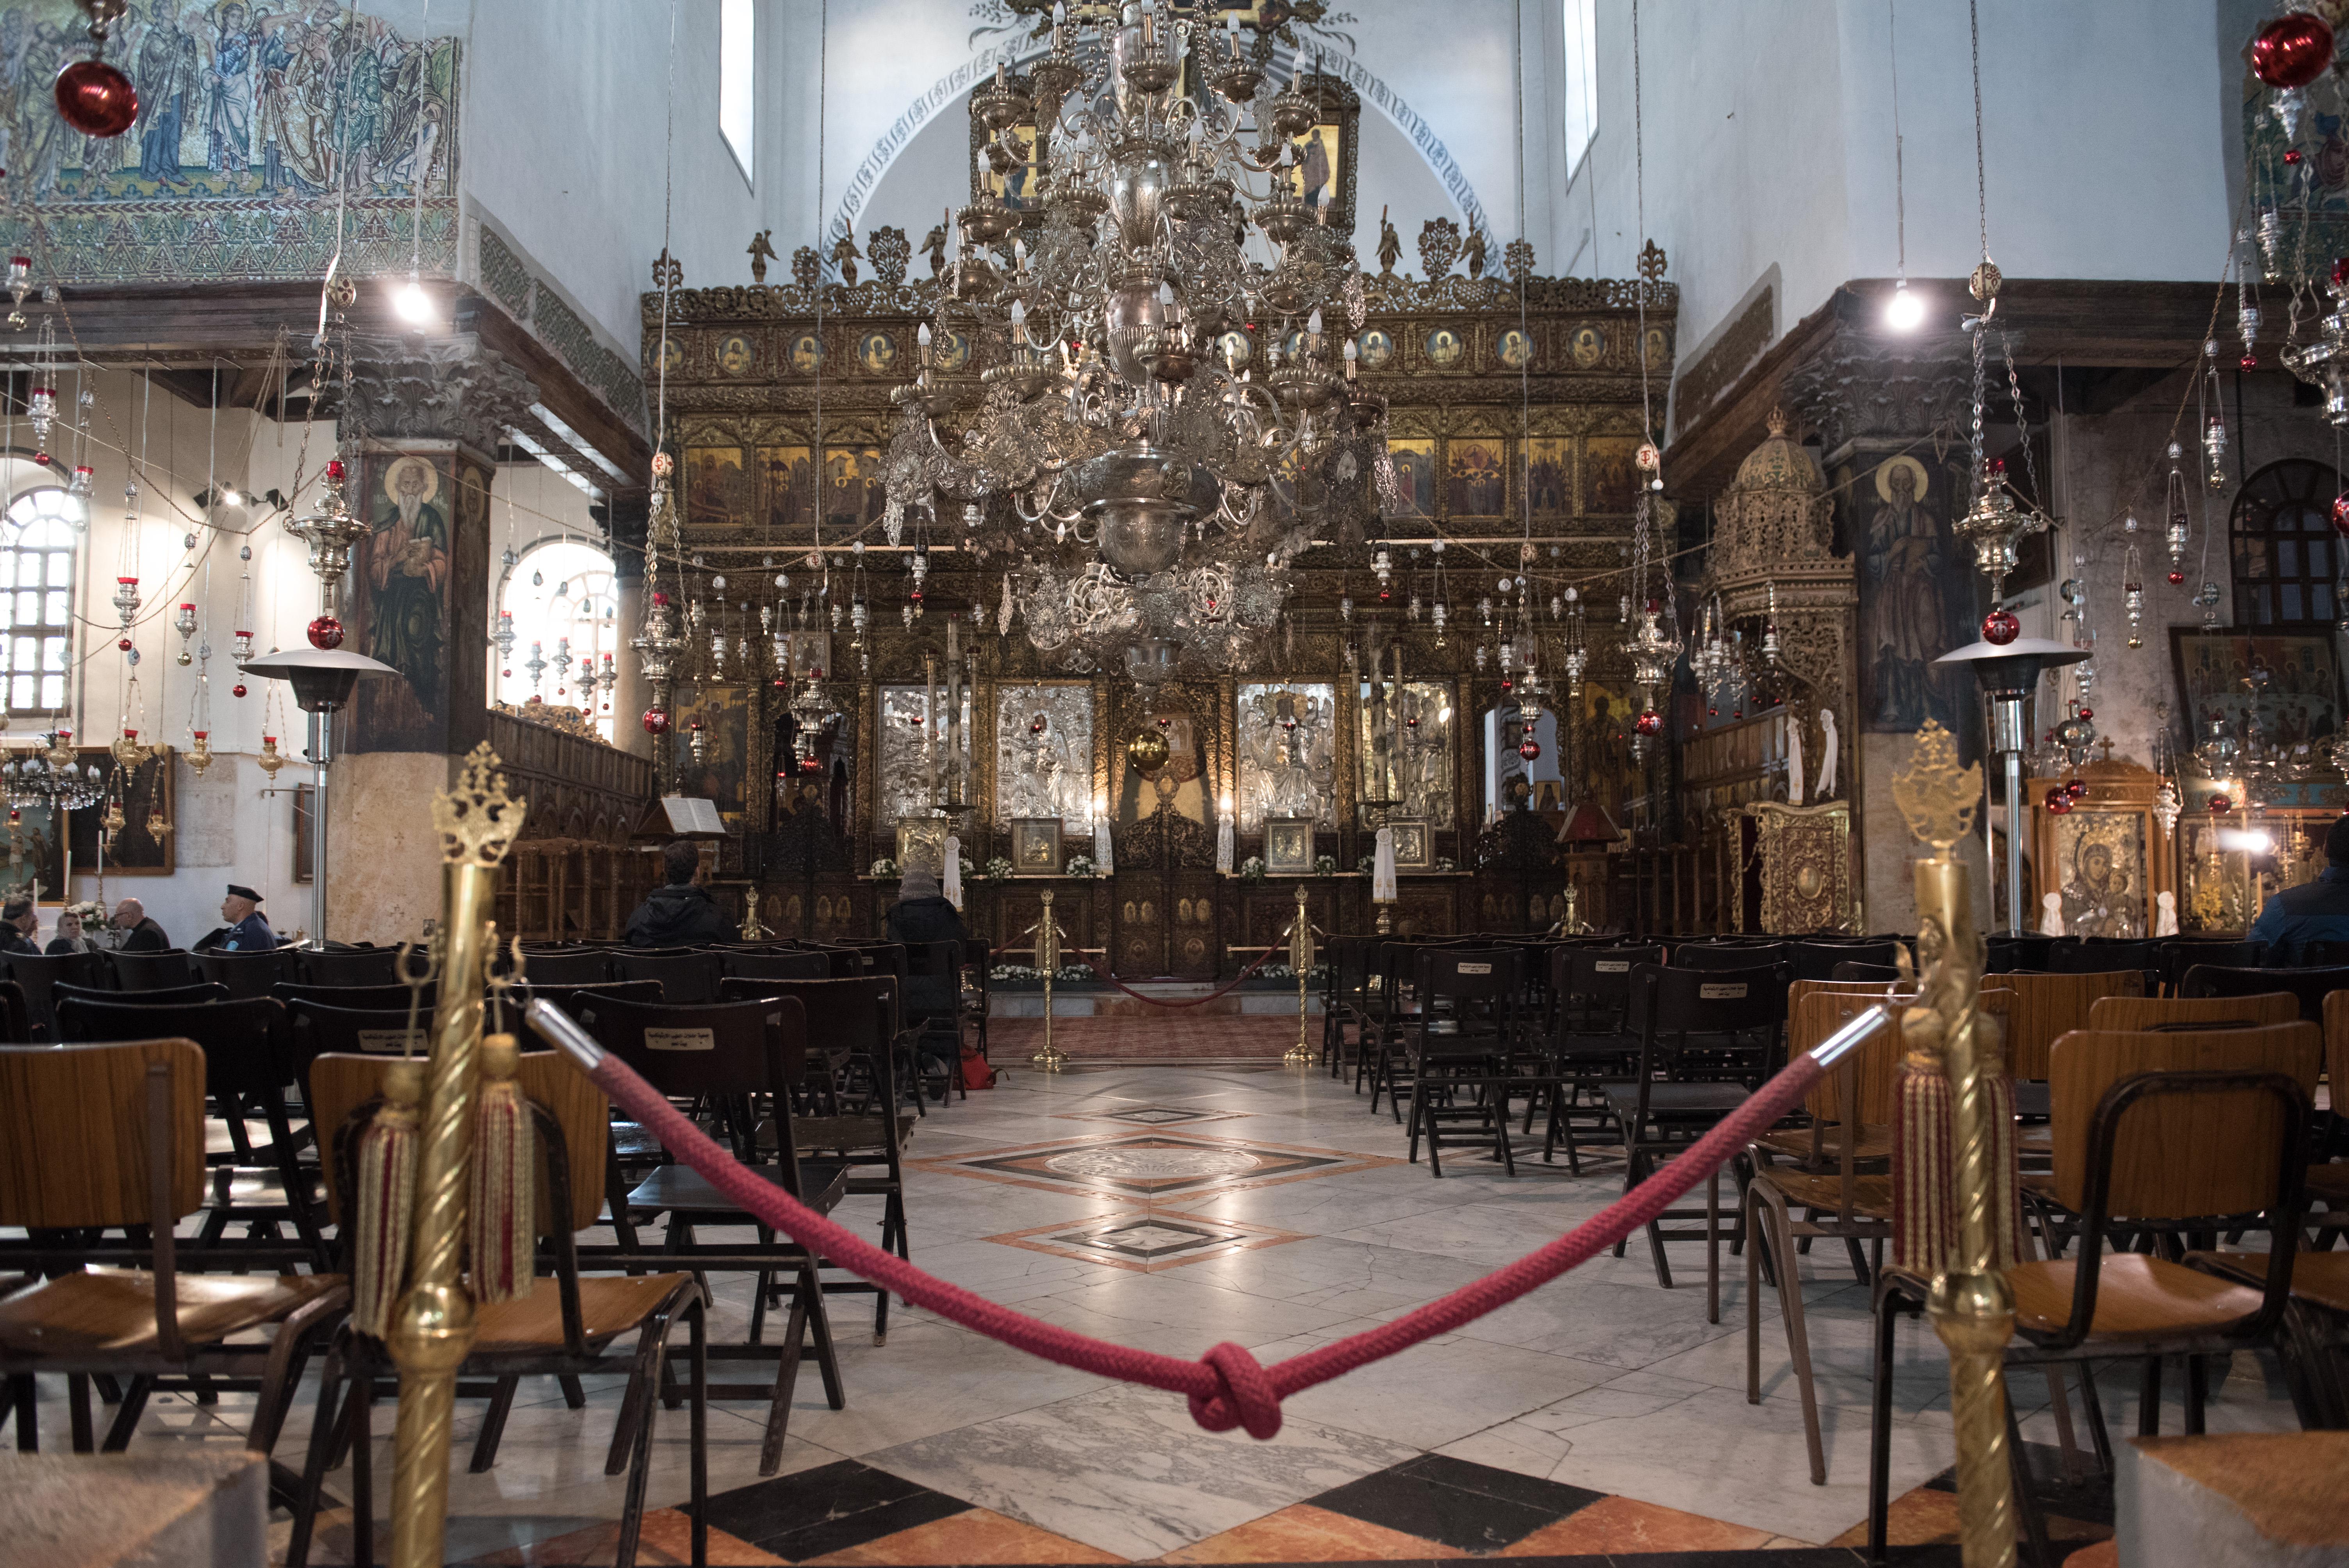 Jeruselum-128